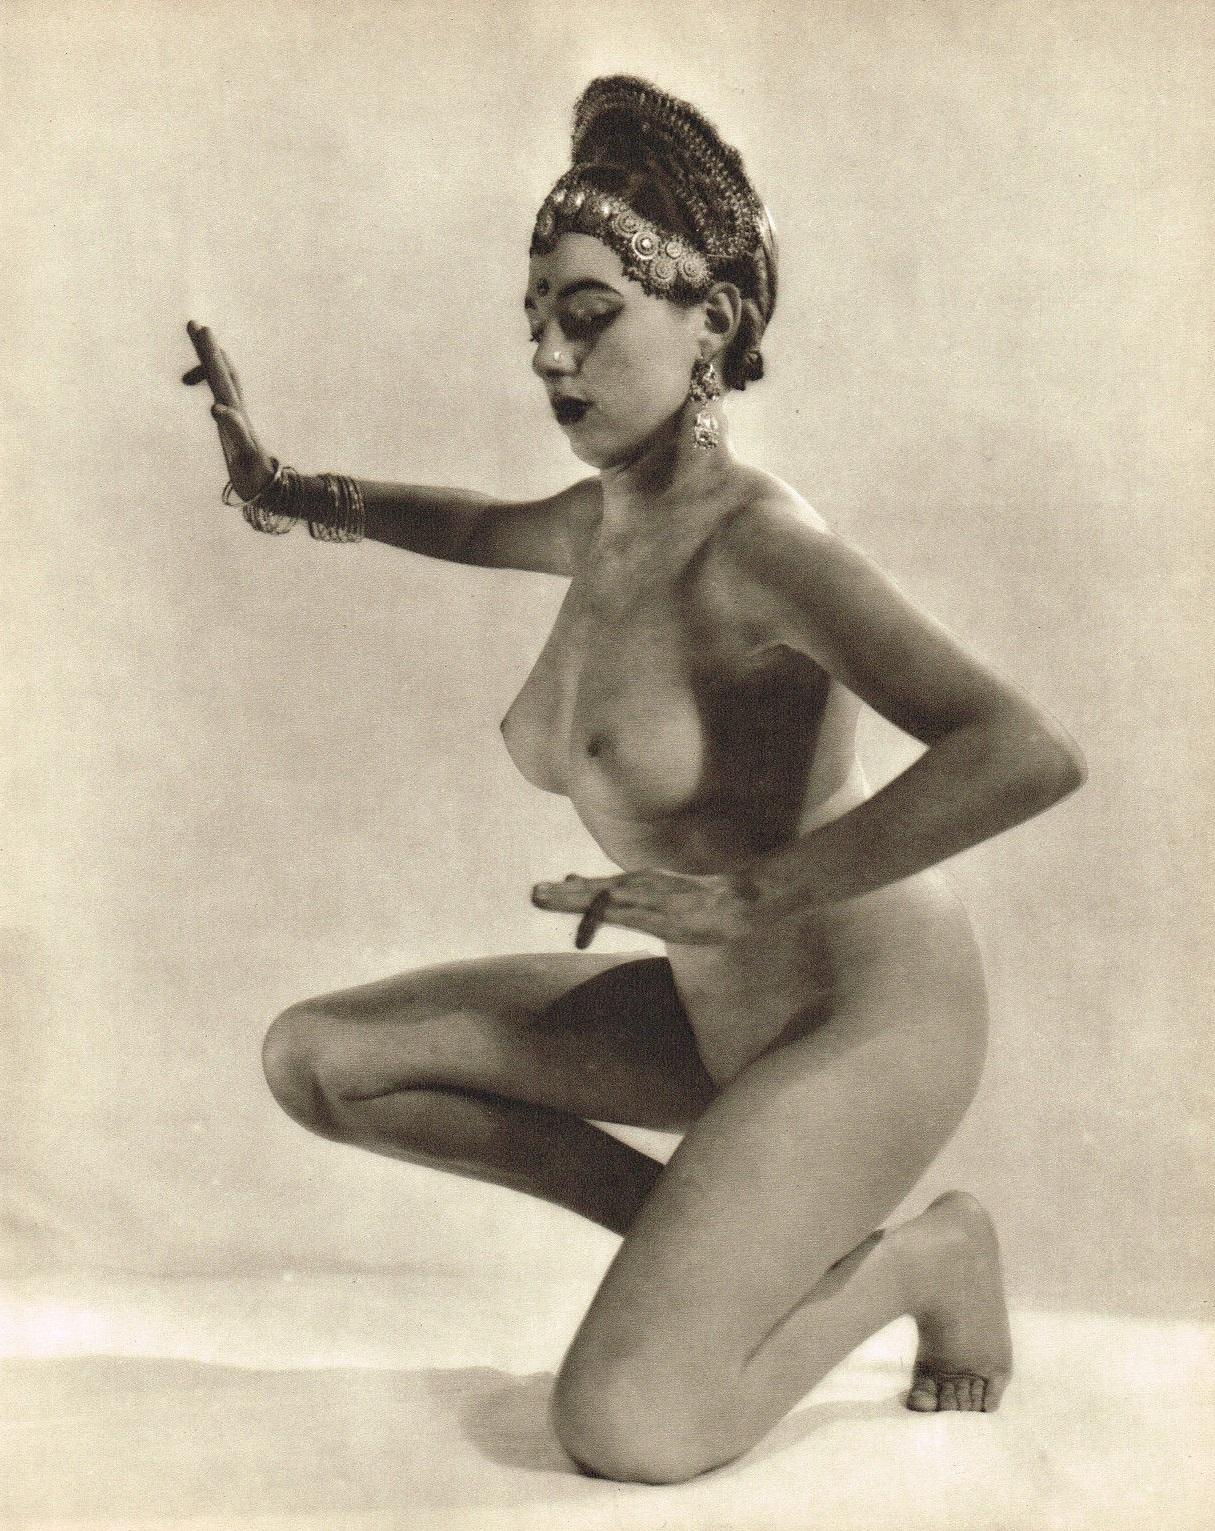 John Everard. Indian Hindu dancer nude photogravure 1950 Oriental Model Published by Robert Hale Ltd., London in 1955.